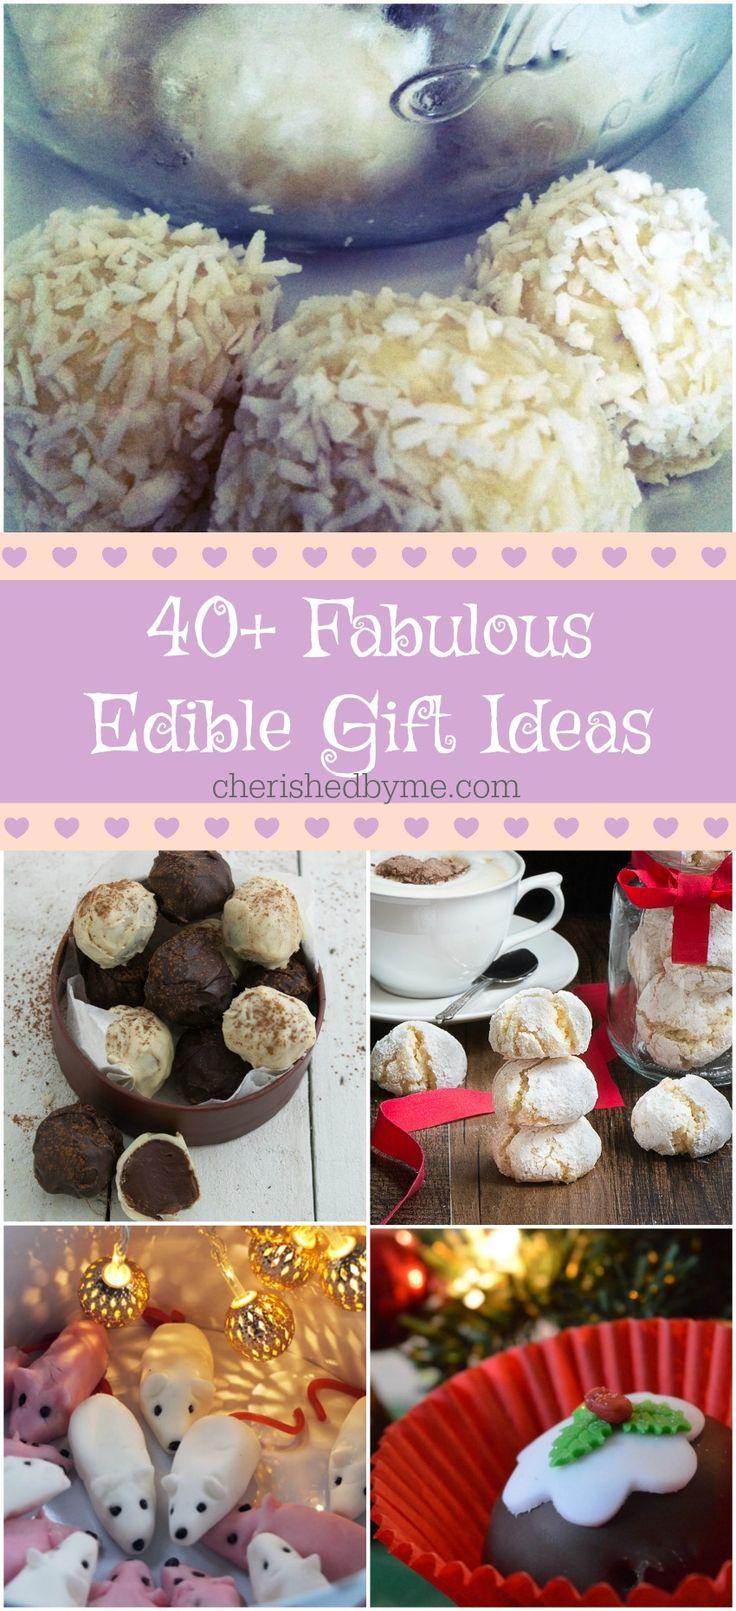 edible gifts - perfect for Christmas